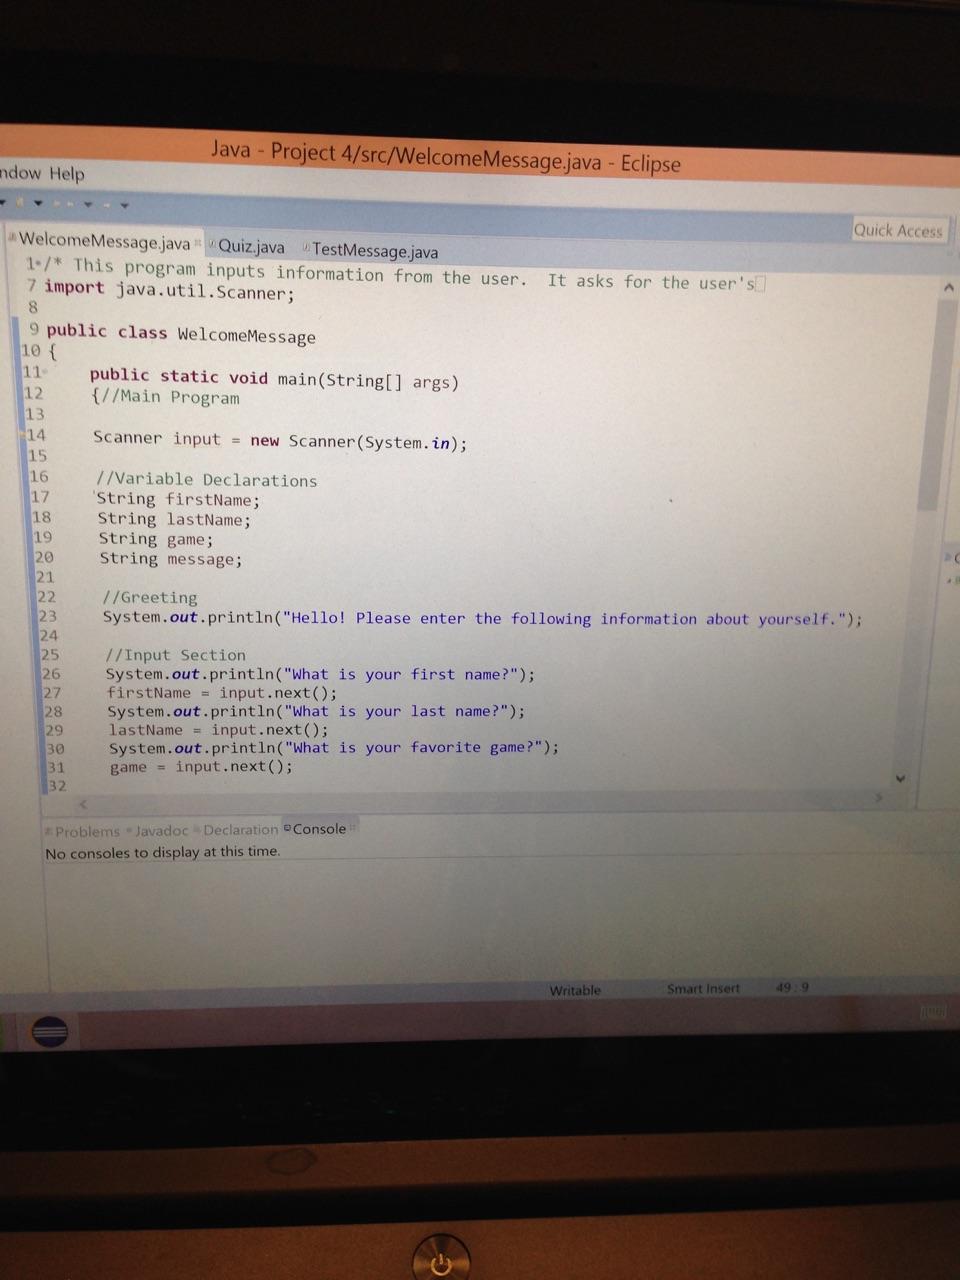 how to take biginteger input in java